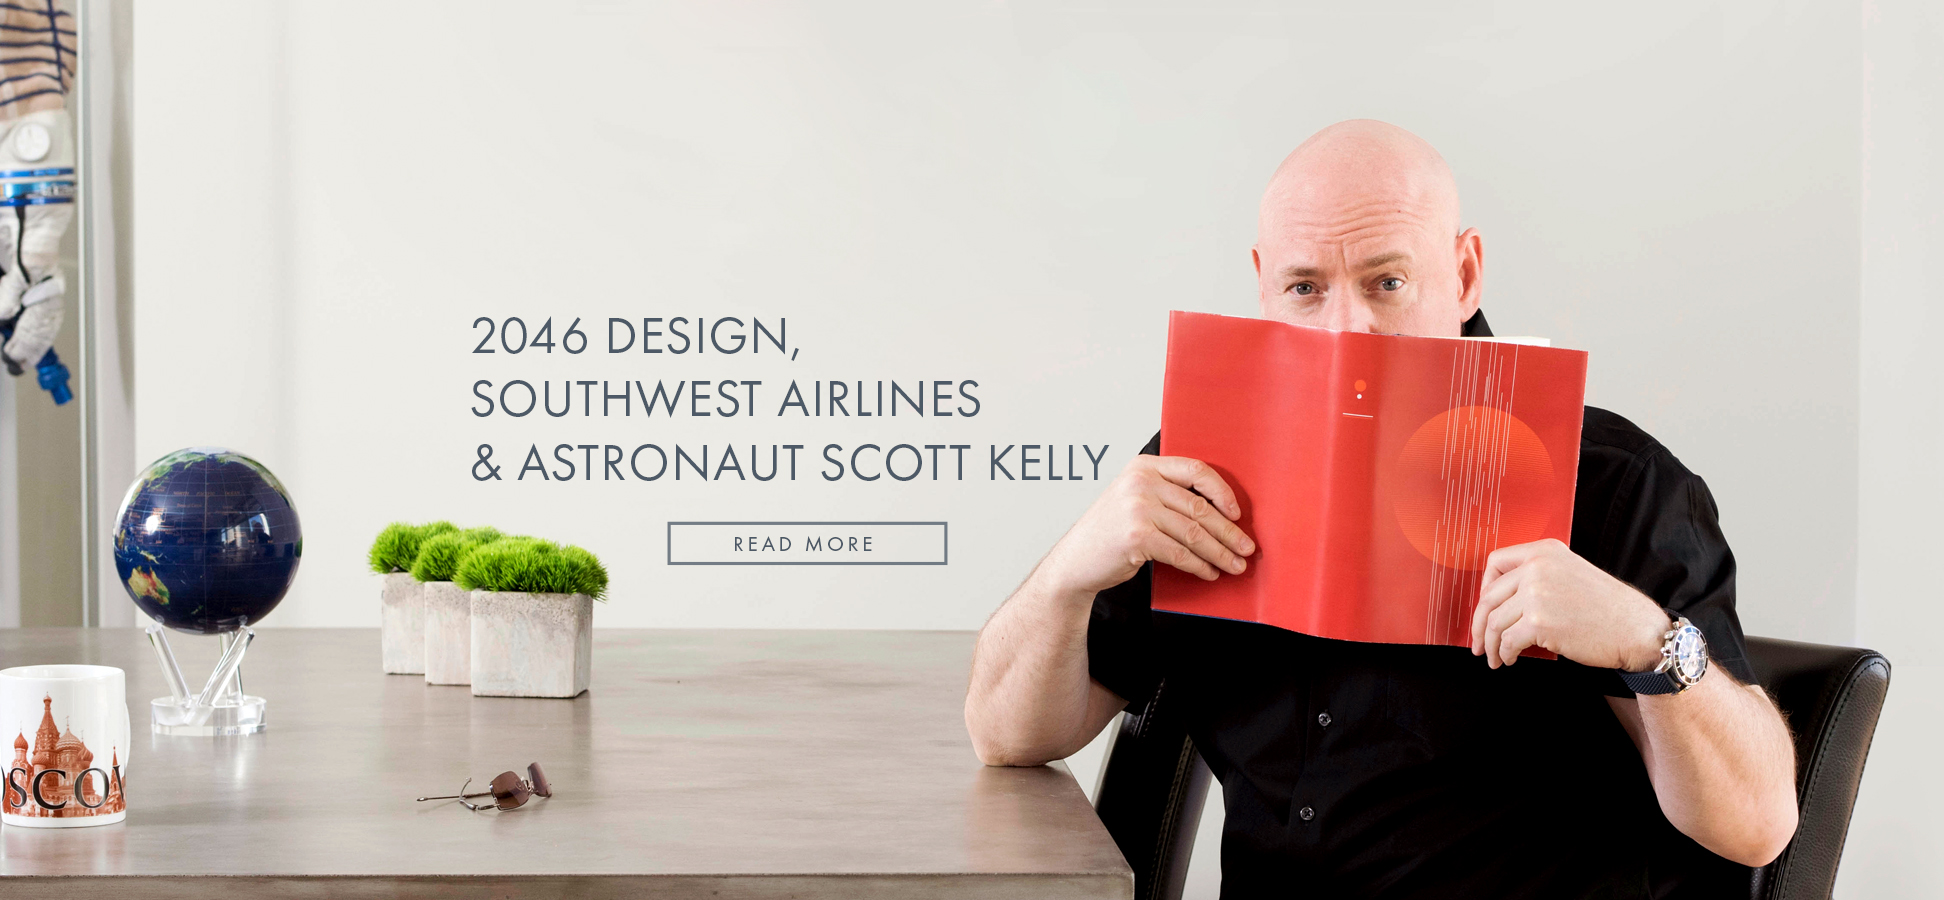 Scott Kelby Blog Front Page image v4